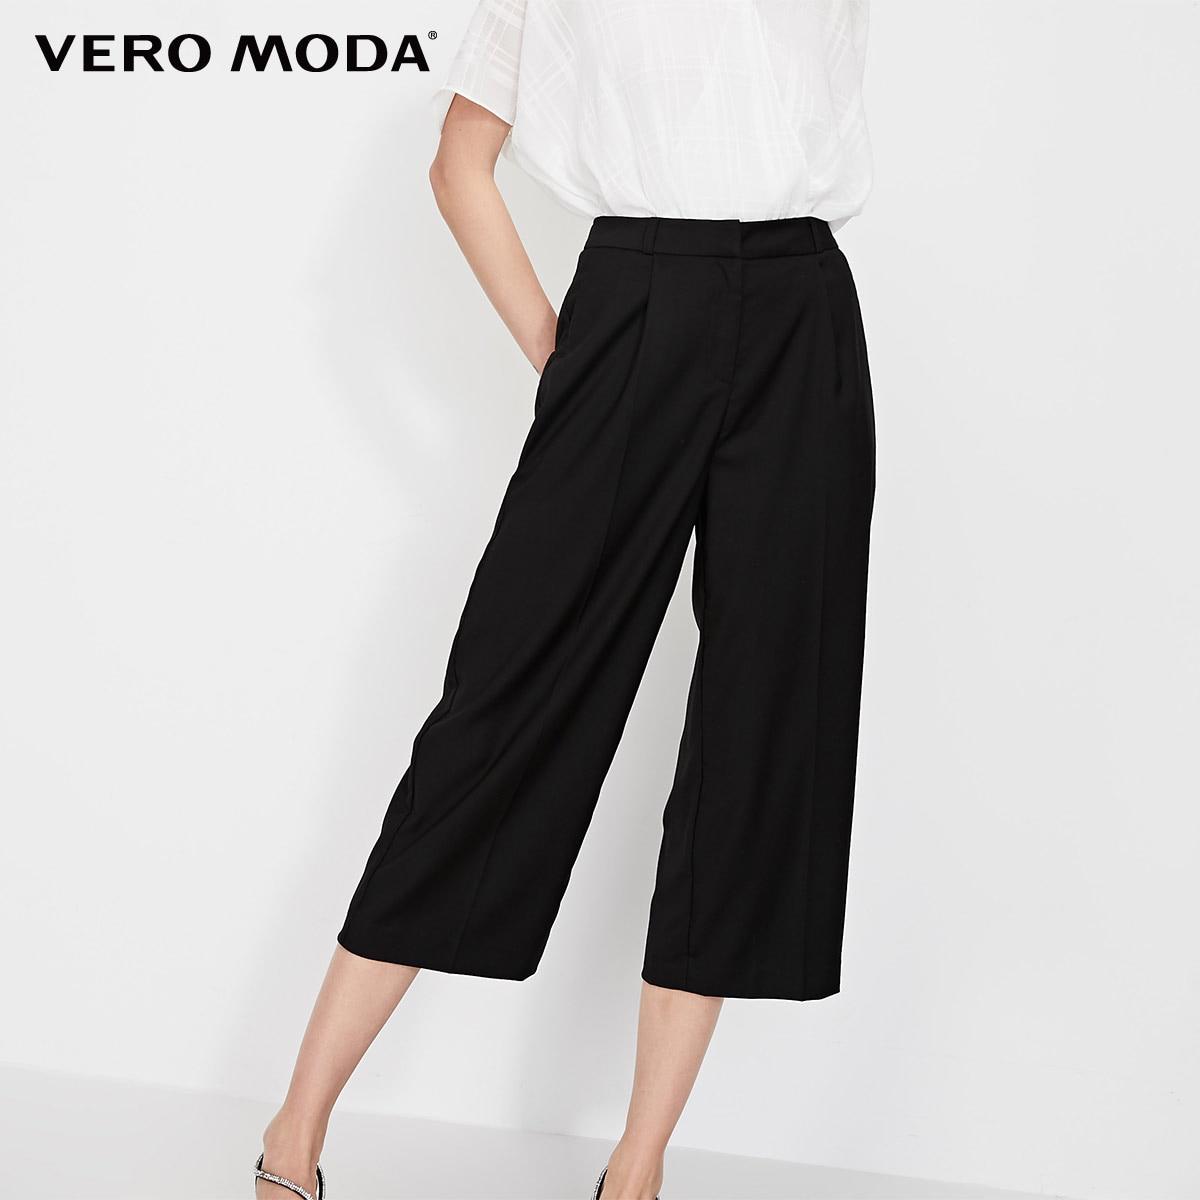 Vero Moda Women's OL Straight Fit Mid-rise Capri Pants   31916J531